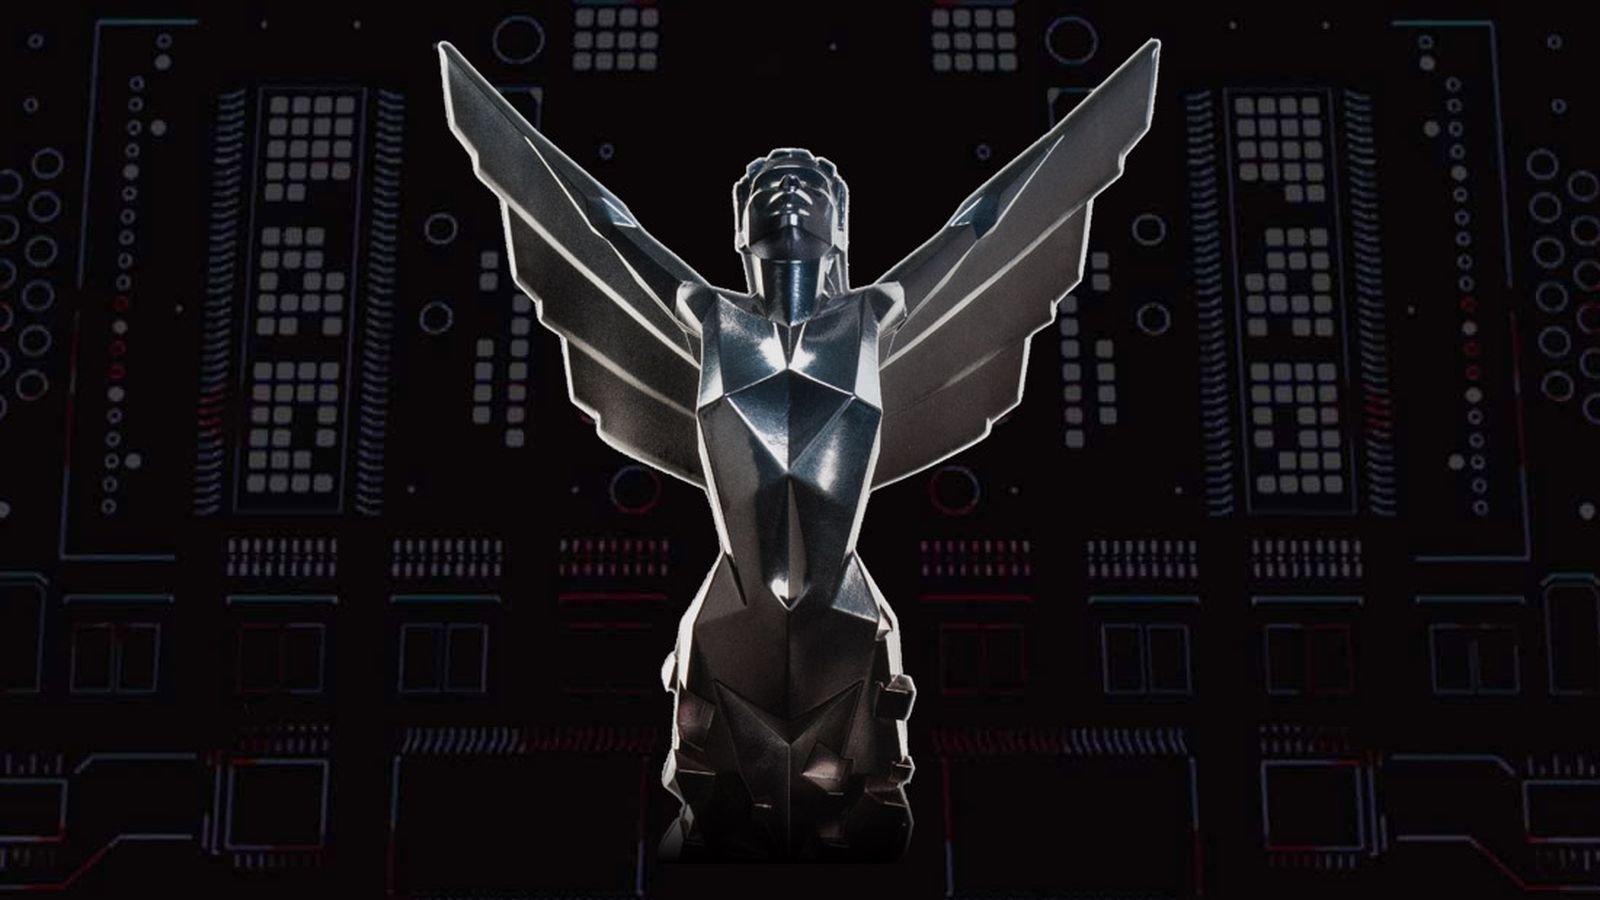 The Game Awards 2019 Show Set For December